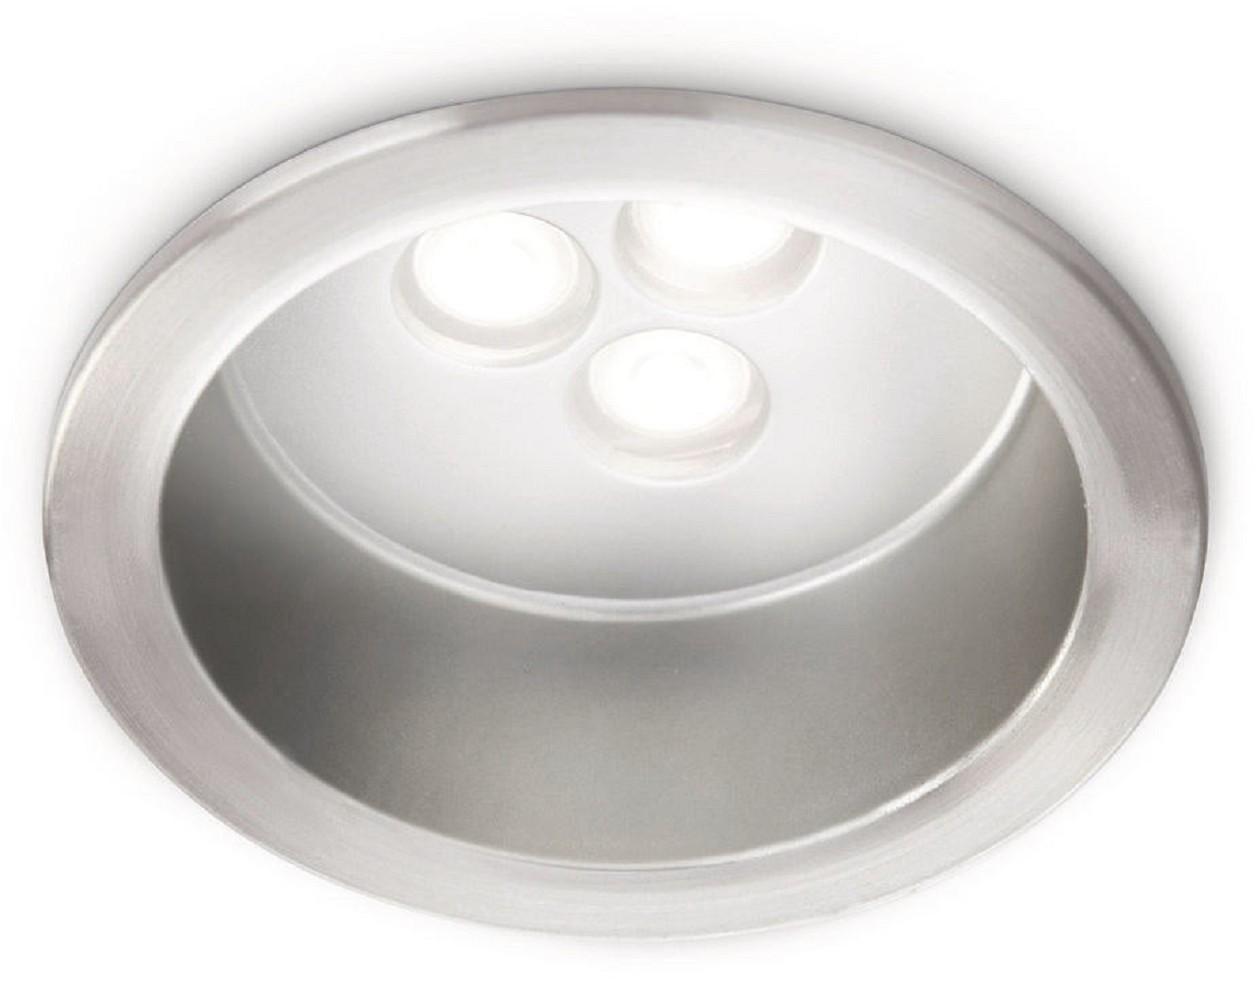 philips instyle 57927 17 16 mybathroom led einbauspot f r badezimmer chrom. Black Bedroom Furniture Sets. Home Design Ideas